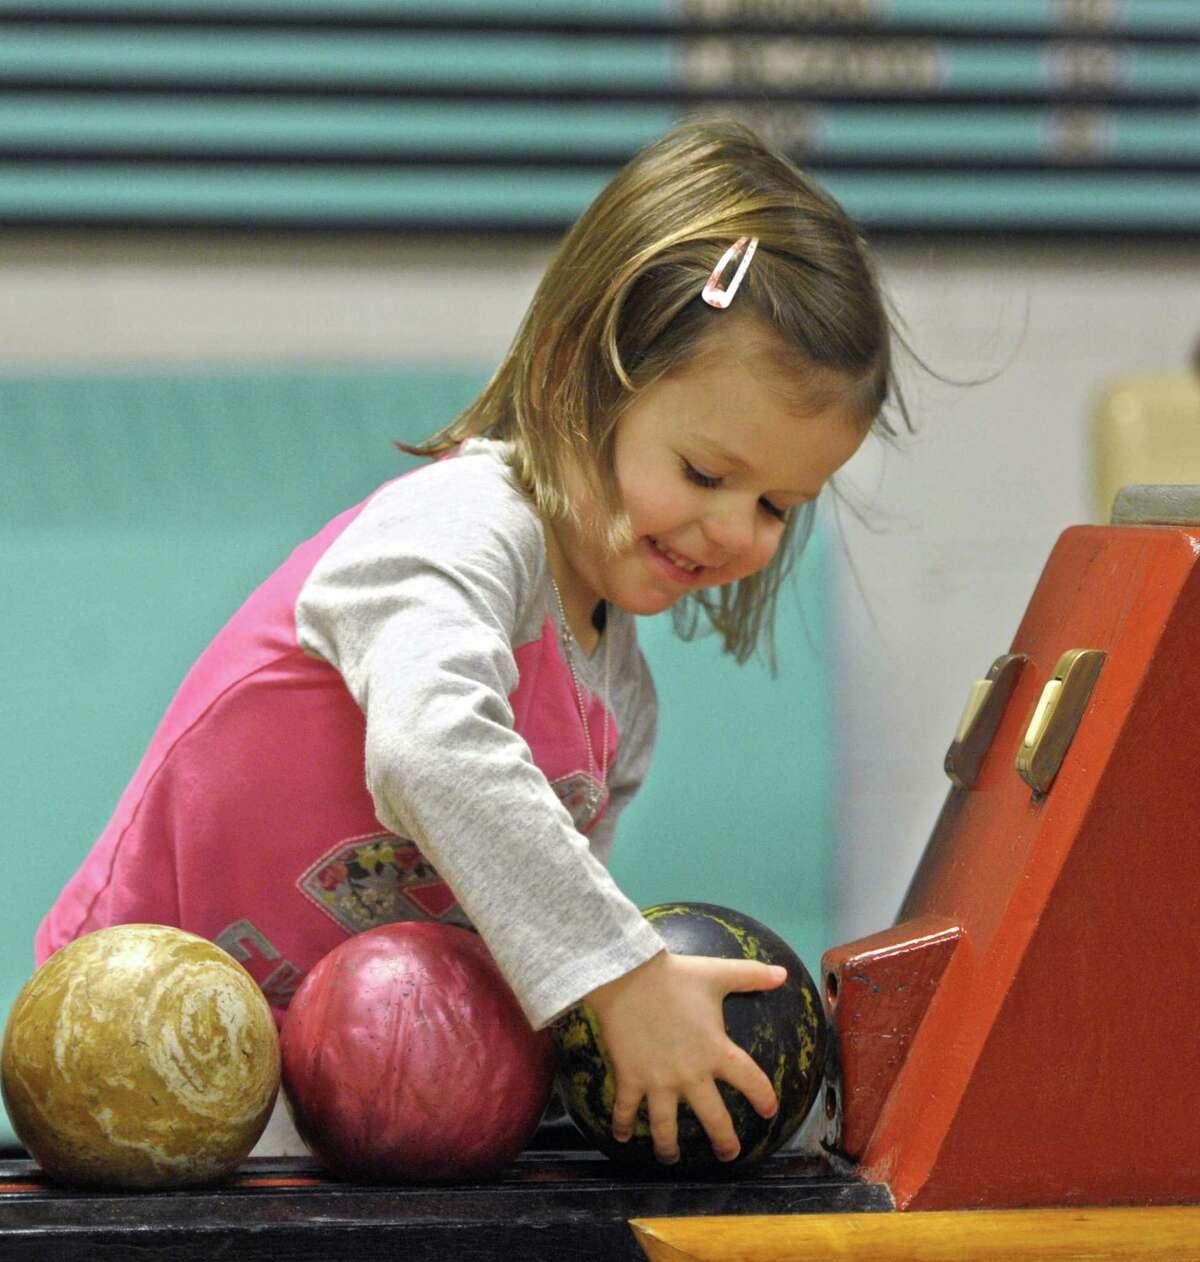 Ellie Pickard, 4, of Newtown, picks a ball while duckpin bowling at Danbury Duckpin Lanes, in Danbury, Conn, on Friday, January 1, 2016.